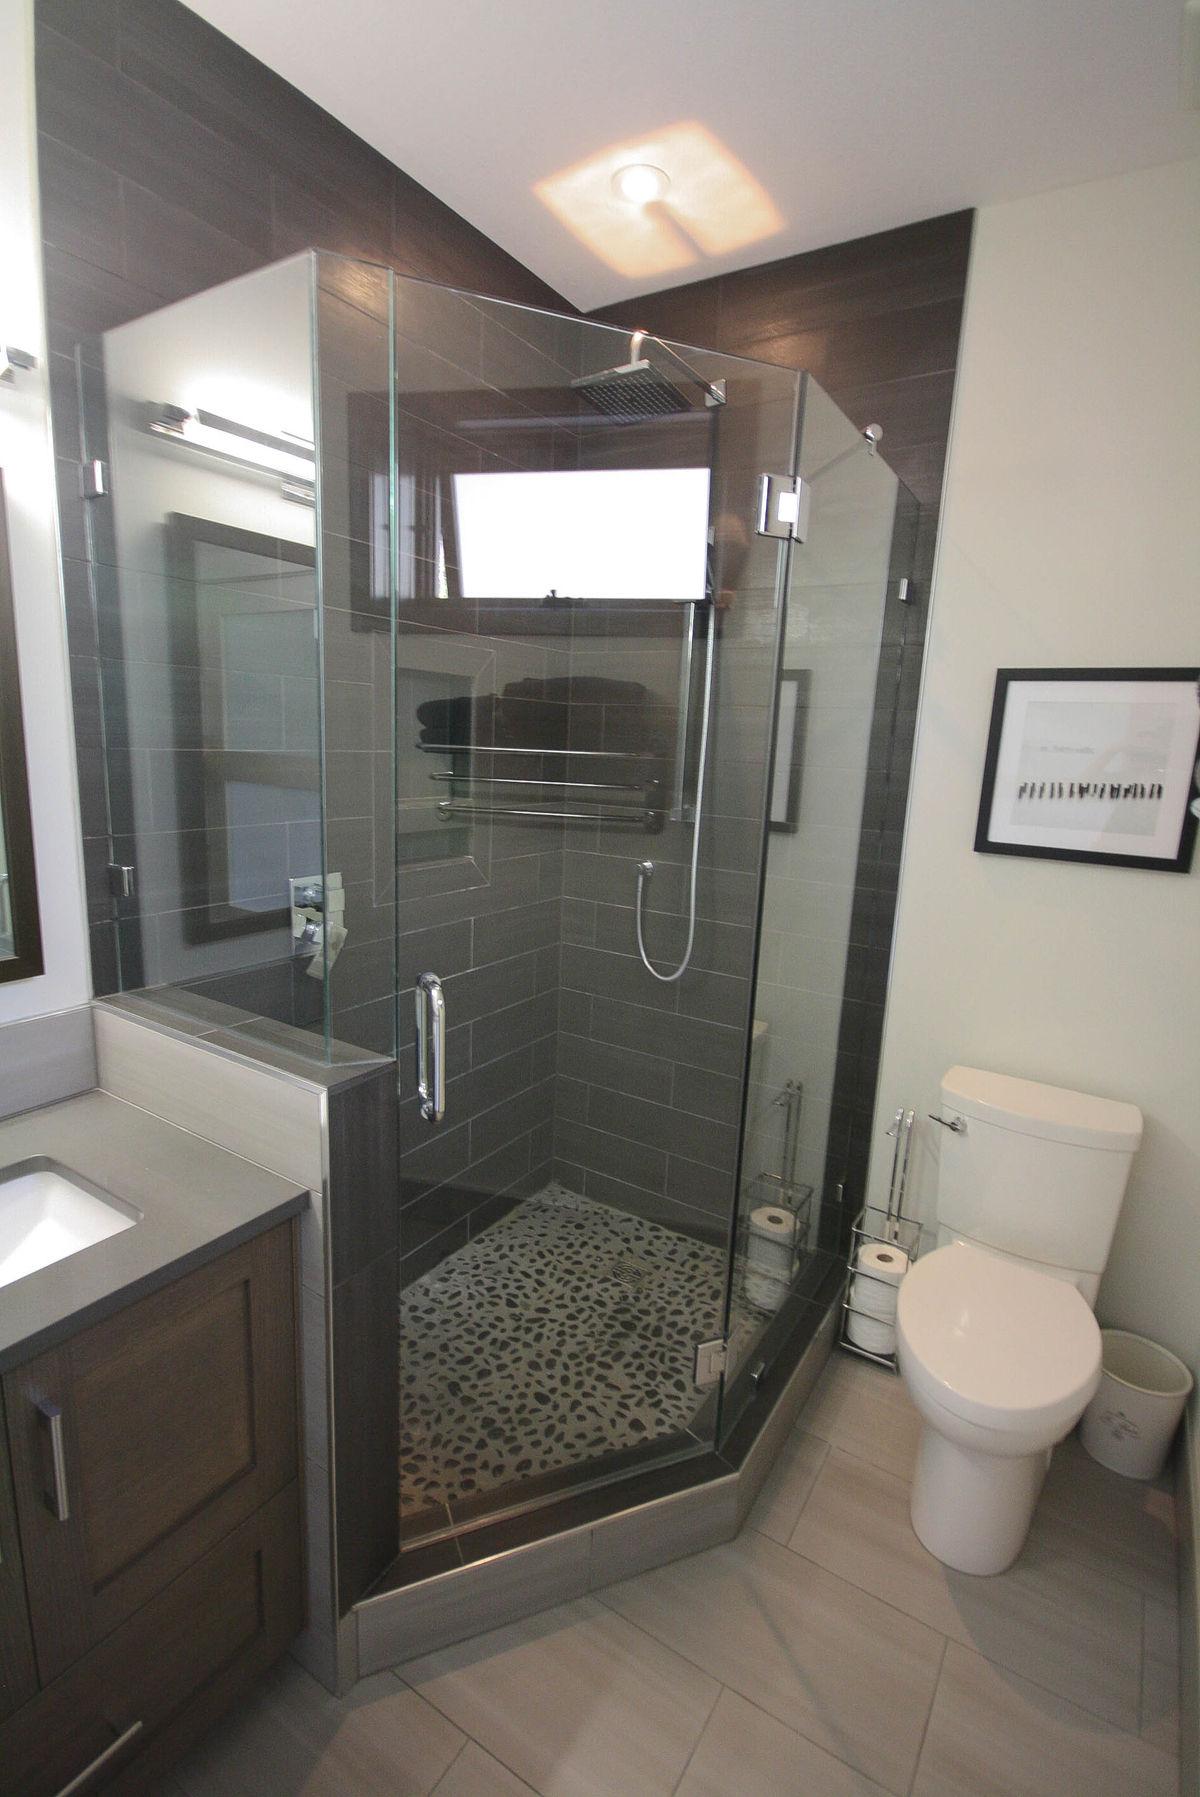 Kelowna Bathroom Renovations Rafter4k Contracting